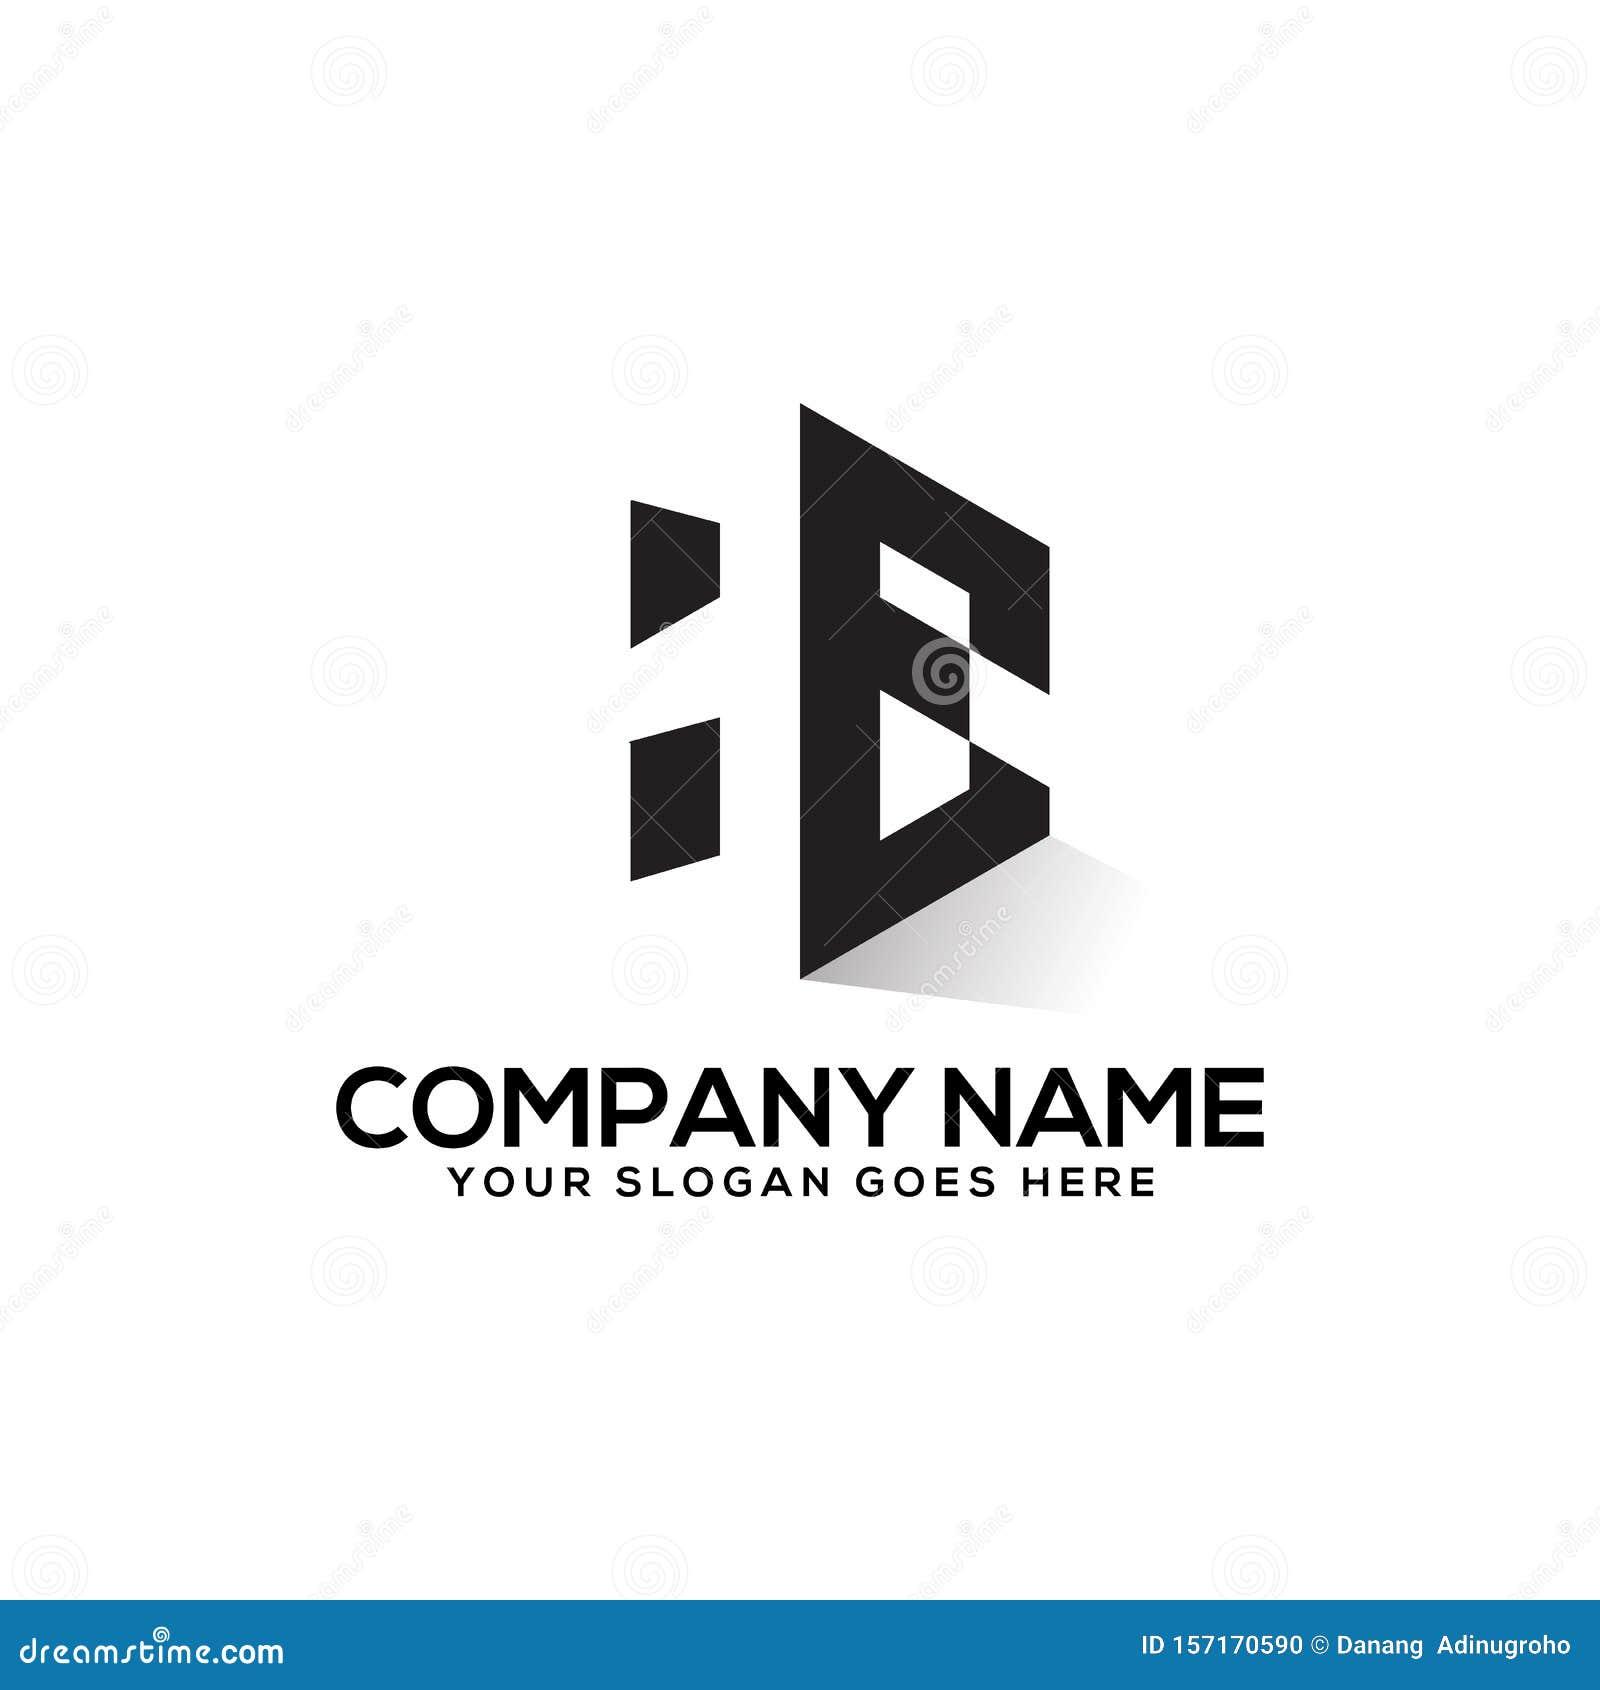 He Initial Logo Inspiration H And E Creative Logo Vector Negative